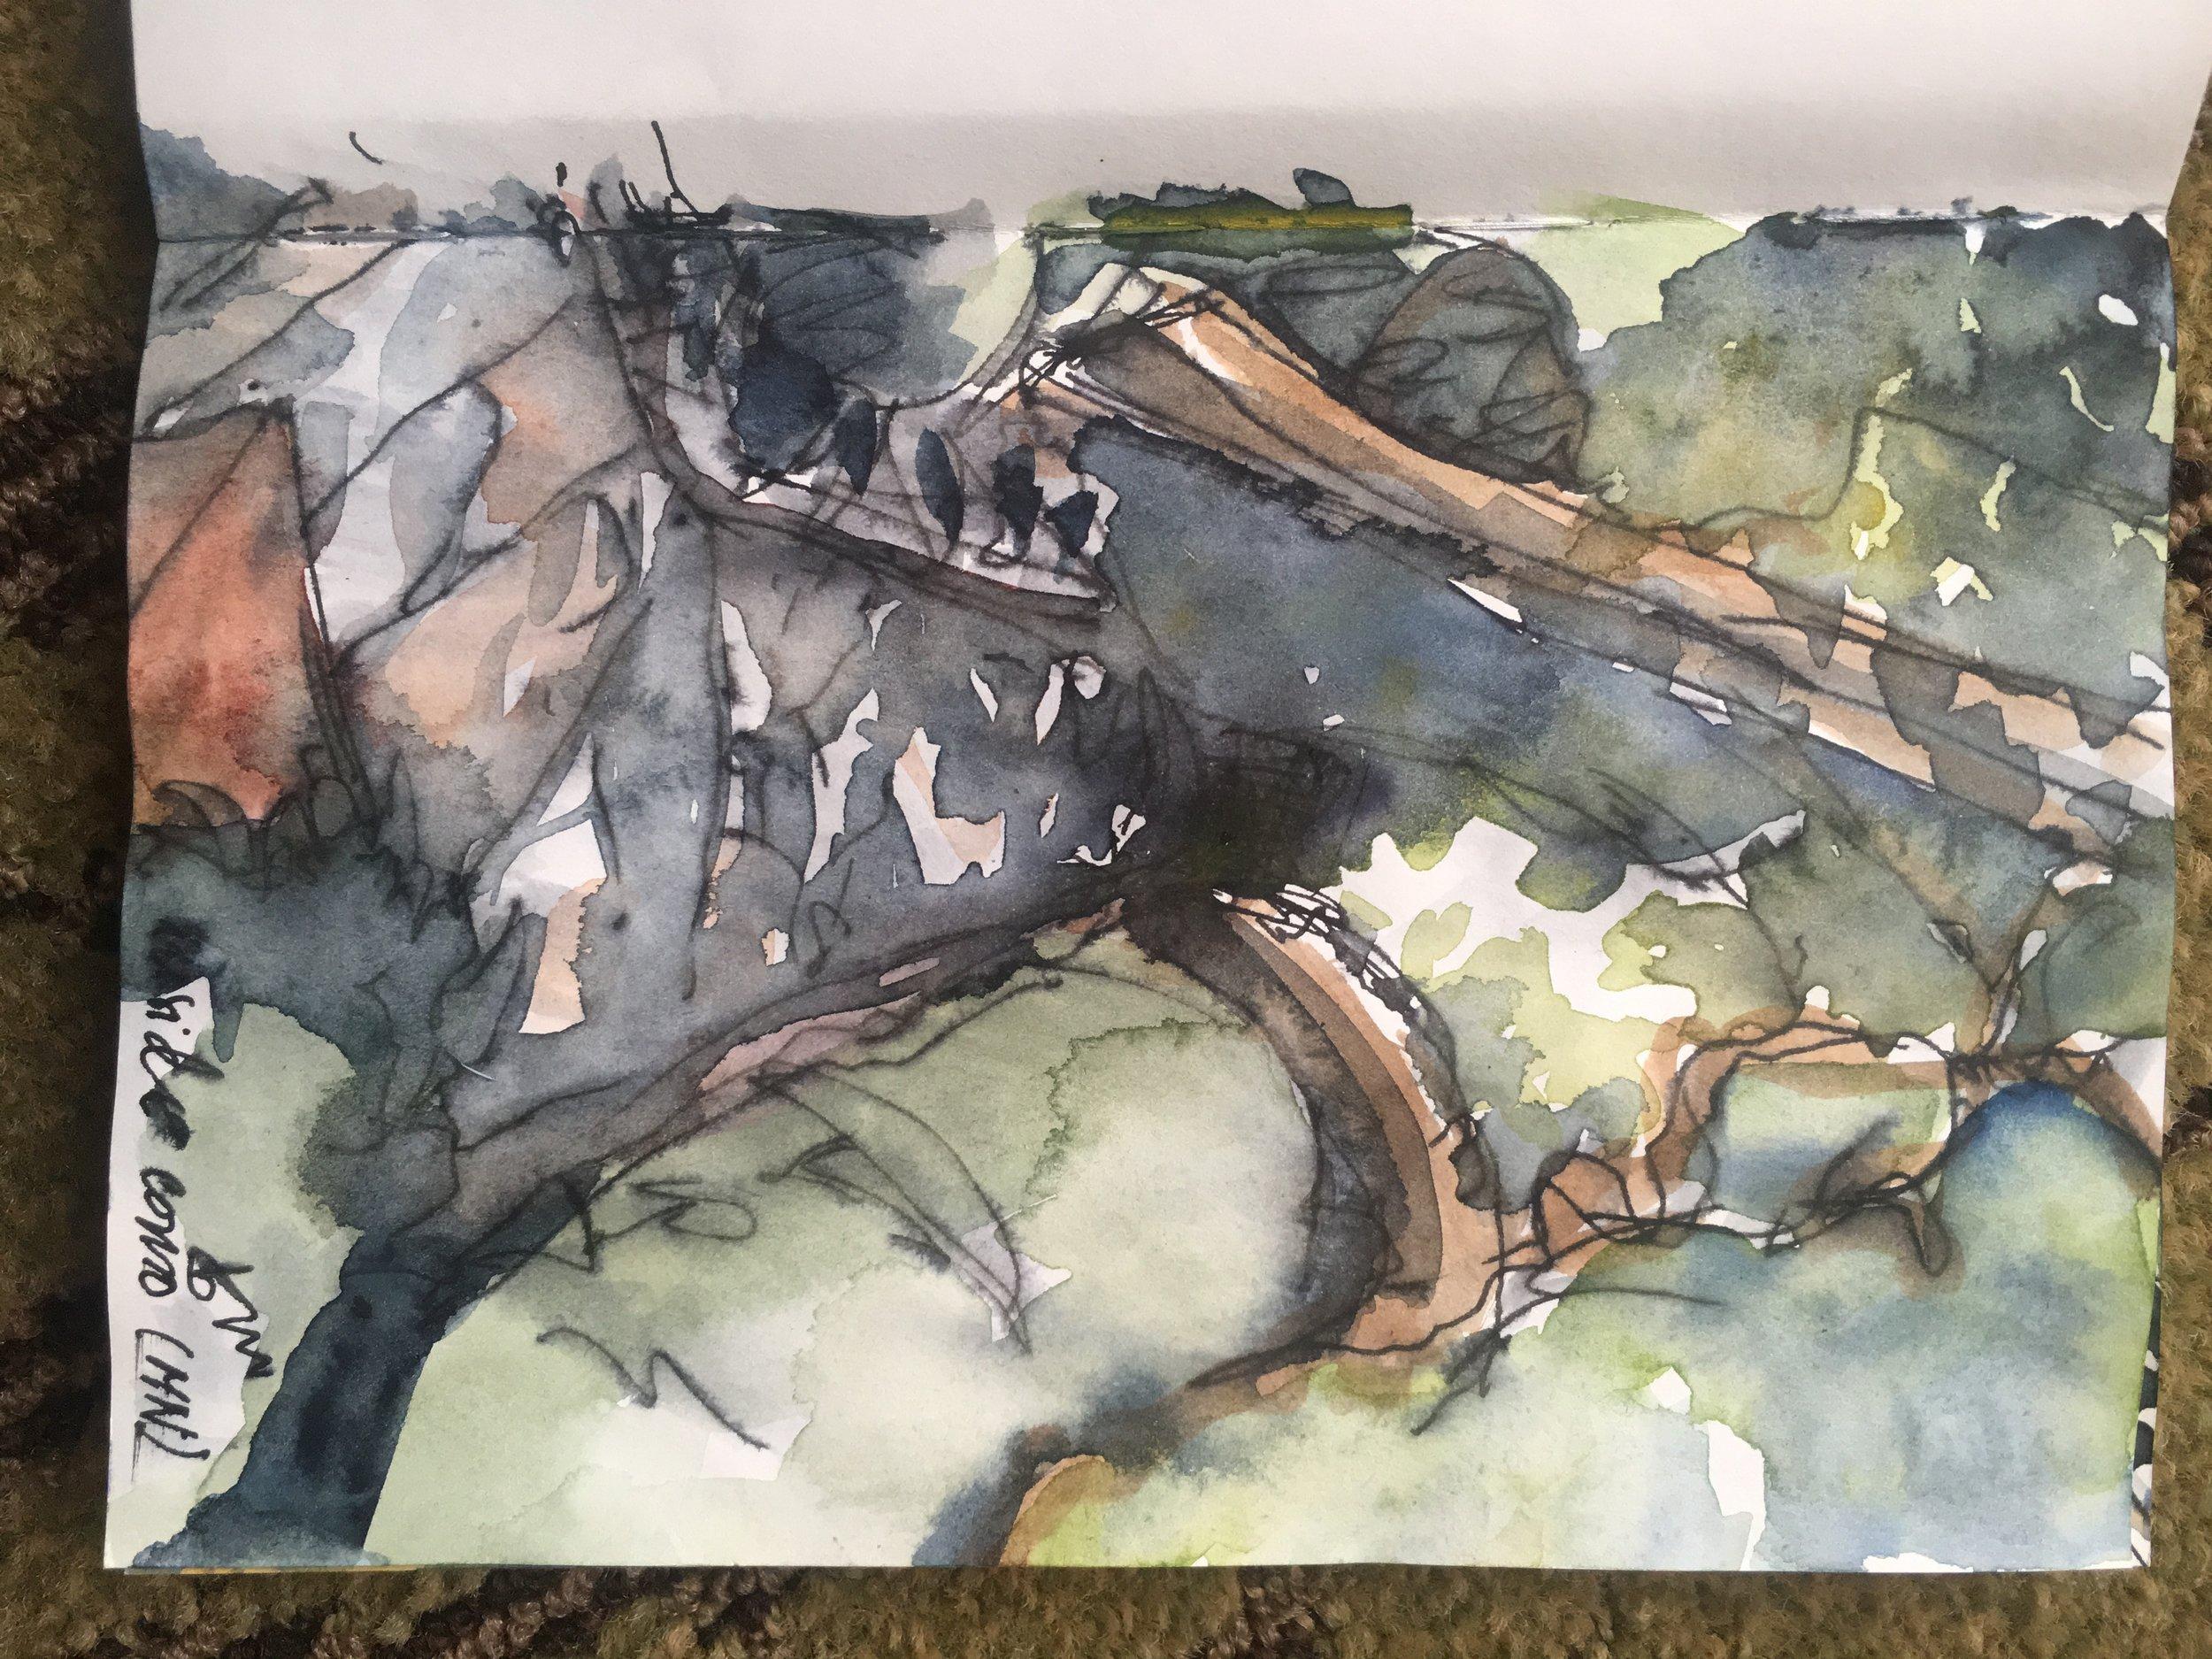 Japanese Garden; Memory of Nagasaki. watercolor & ink, journal, 2016.8.30 ©beth vendryes williams